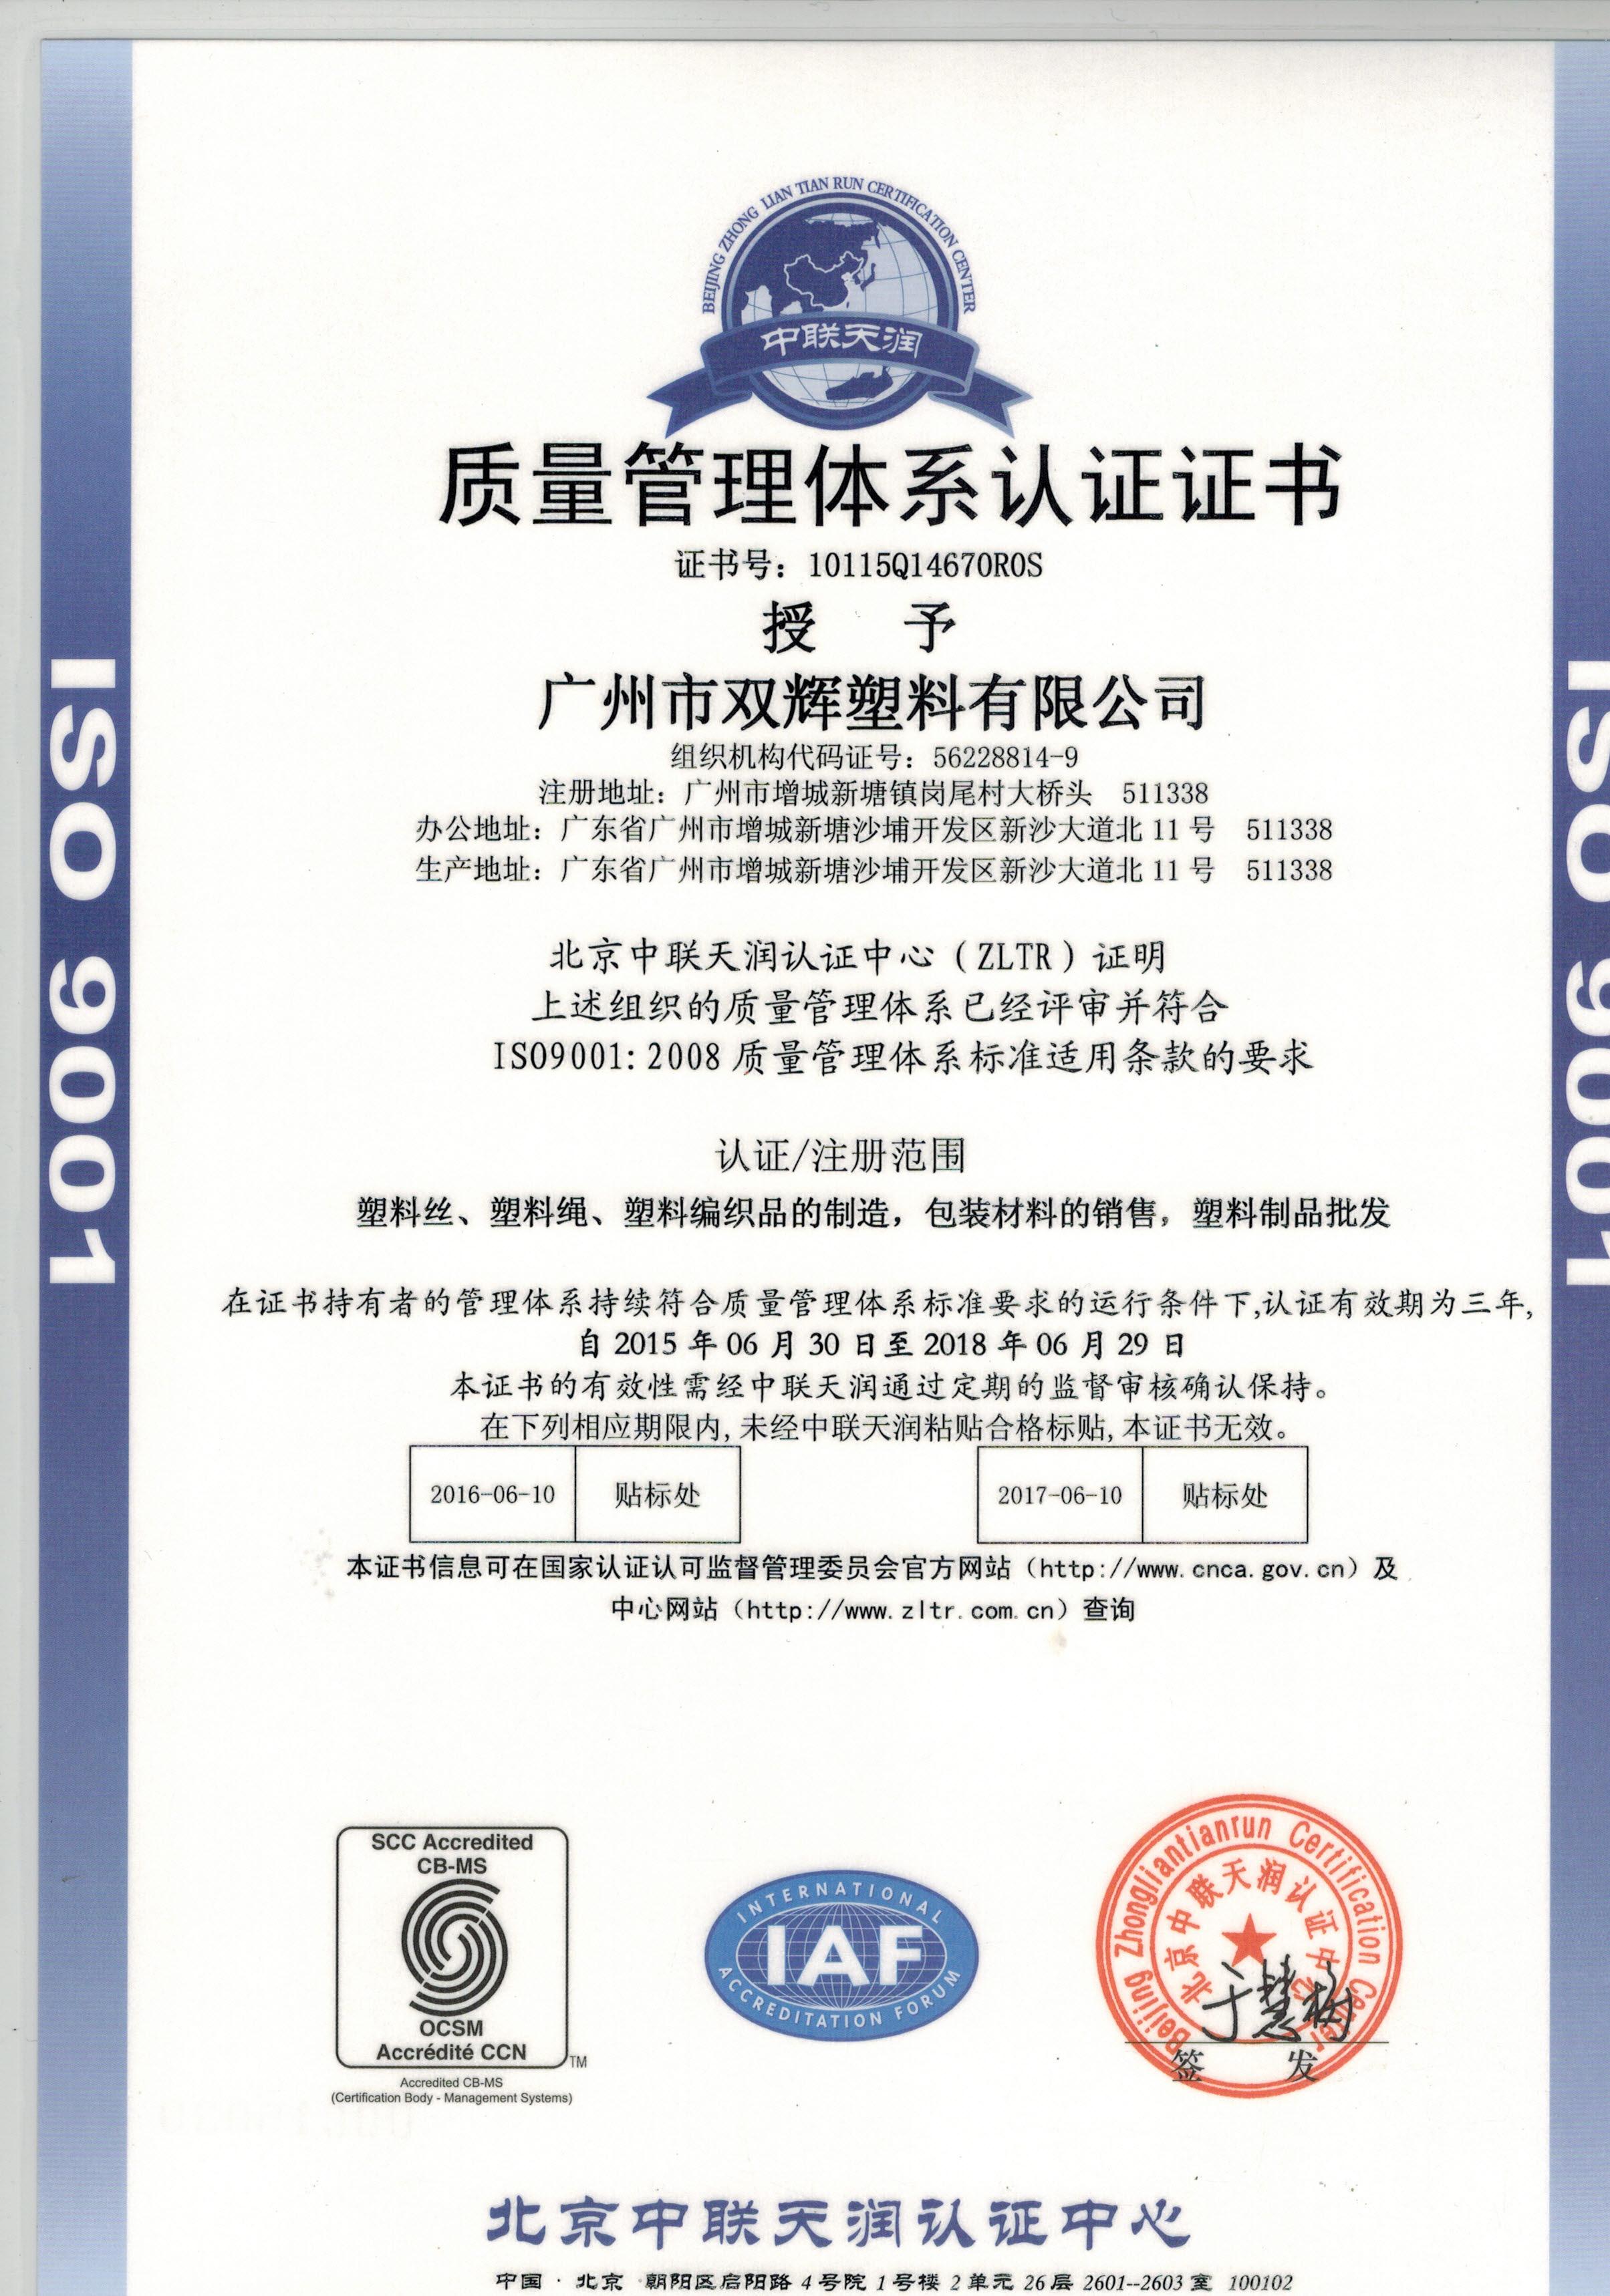 雙輝ISO9001質量管理體系認證